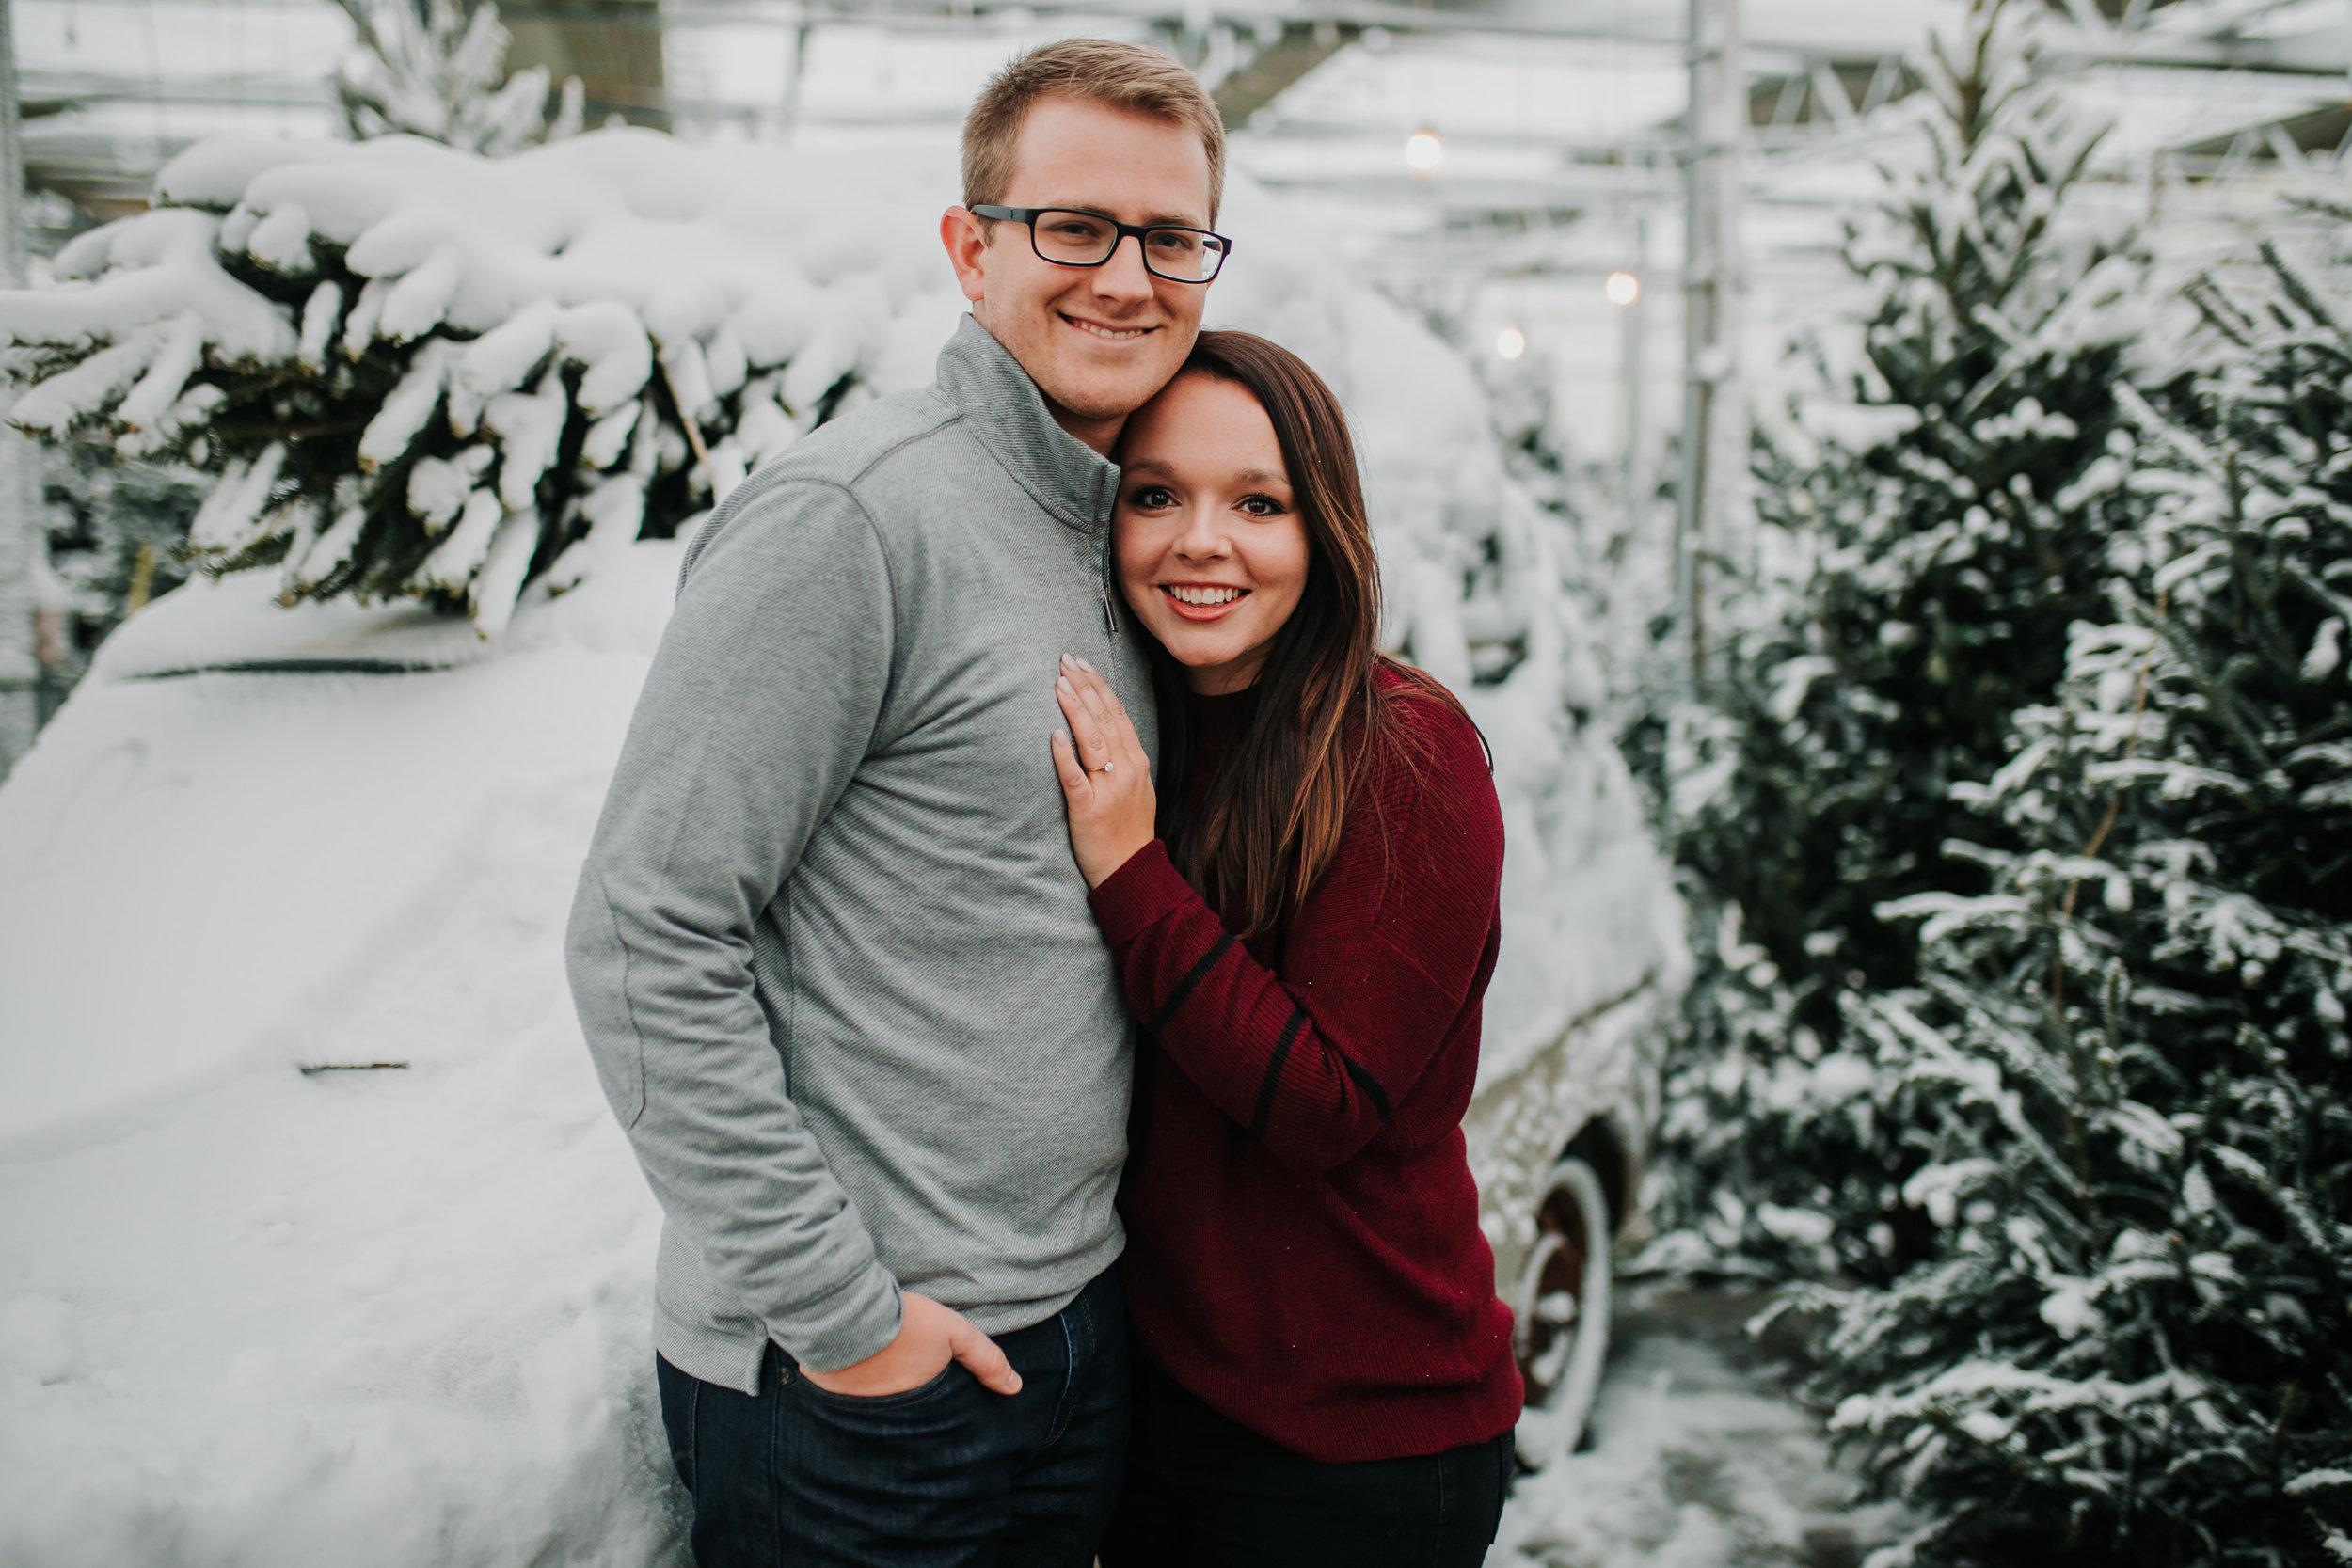 Vanessa & Dan - Engaged - Nathaniel Jensen Photography - Omaha Nebraska Wedding Photographer - Standing Bear Lake - Snowy Engagement Session-84.jpg